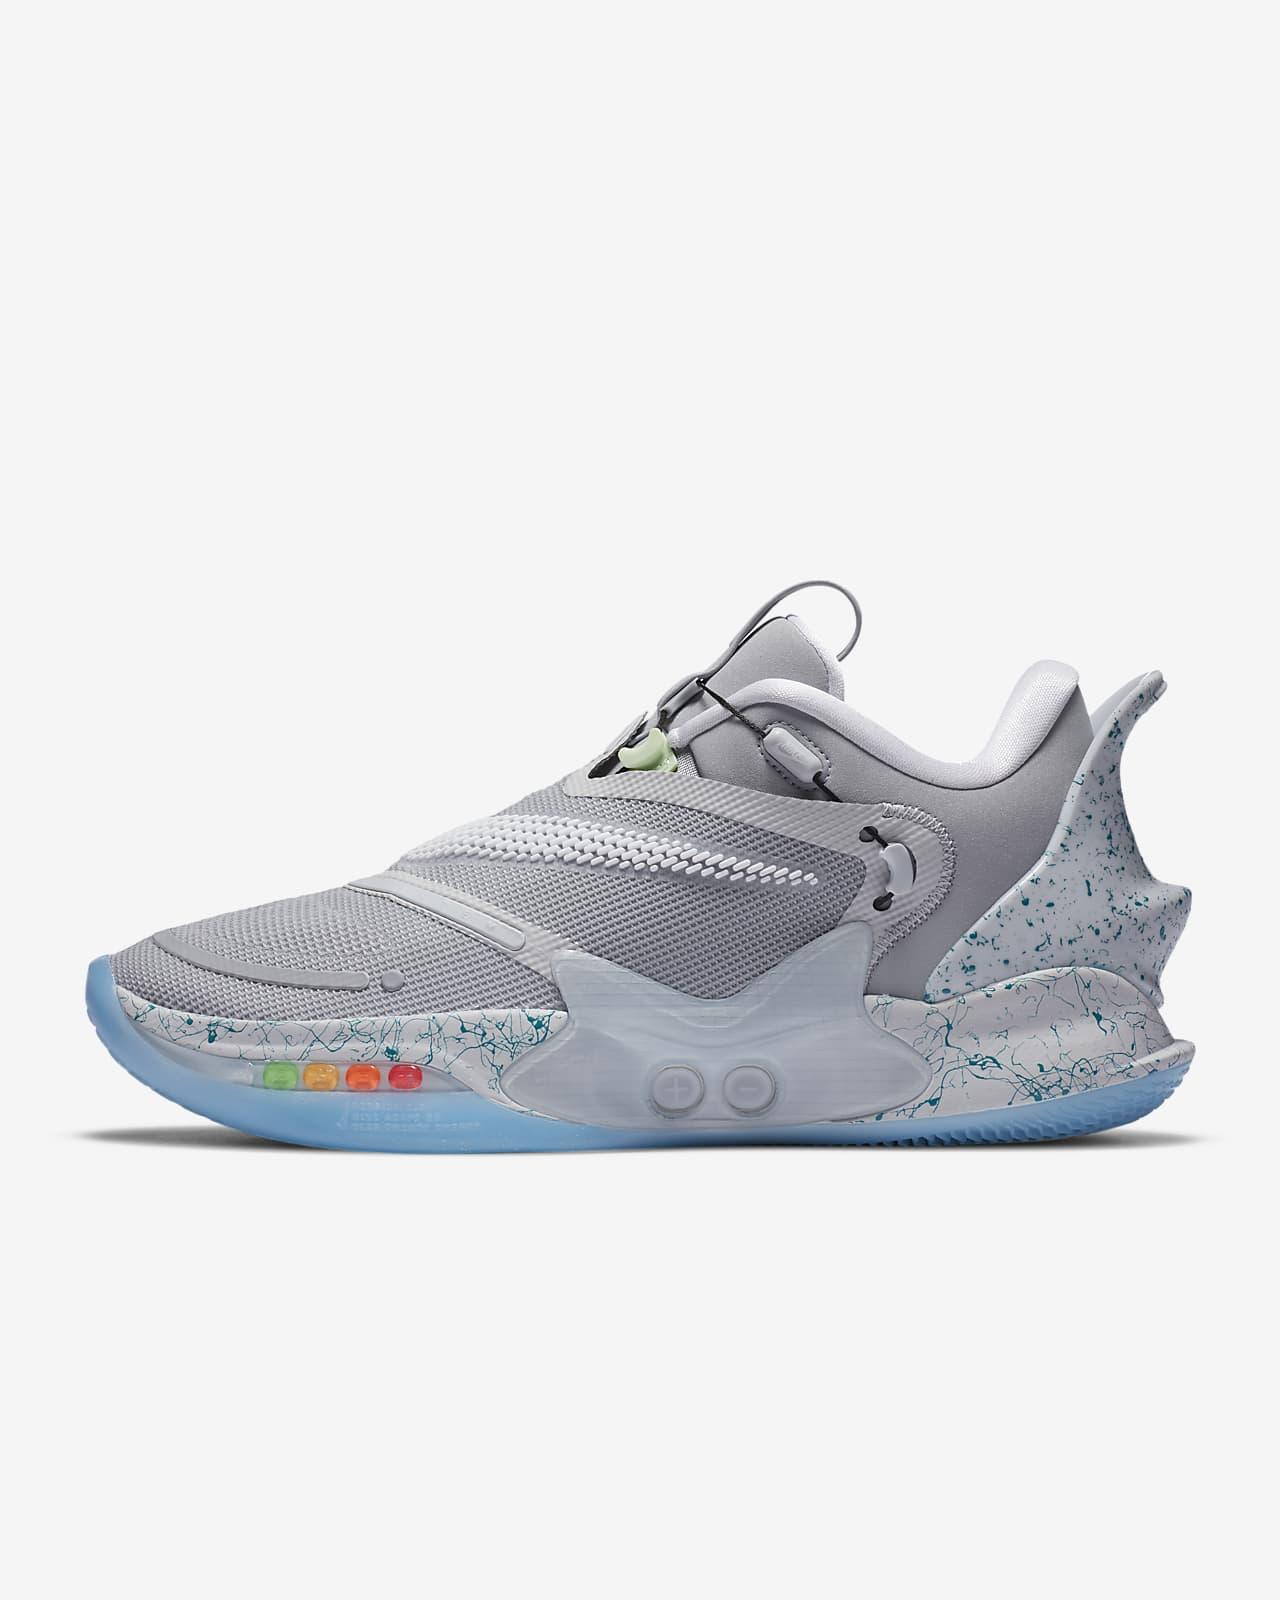 Chaussure de basketball Nike Adapt BB 2.0